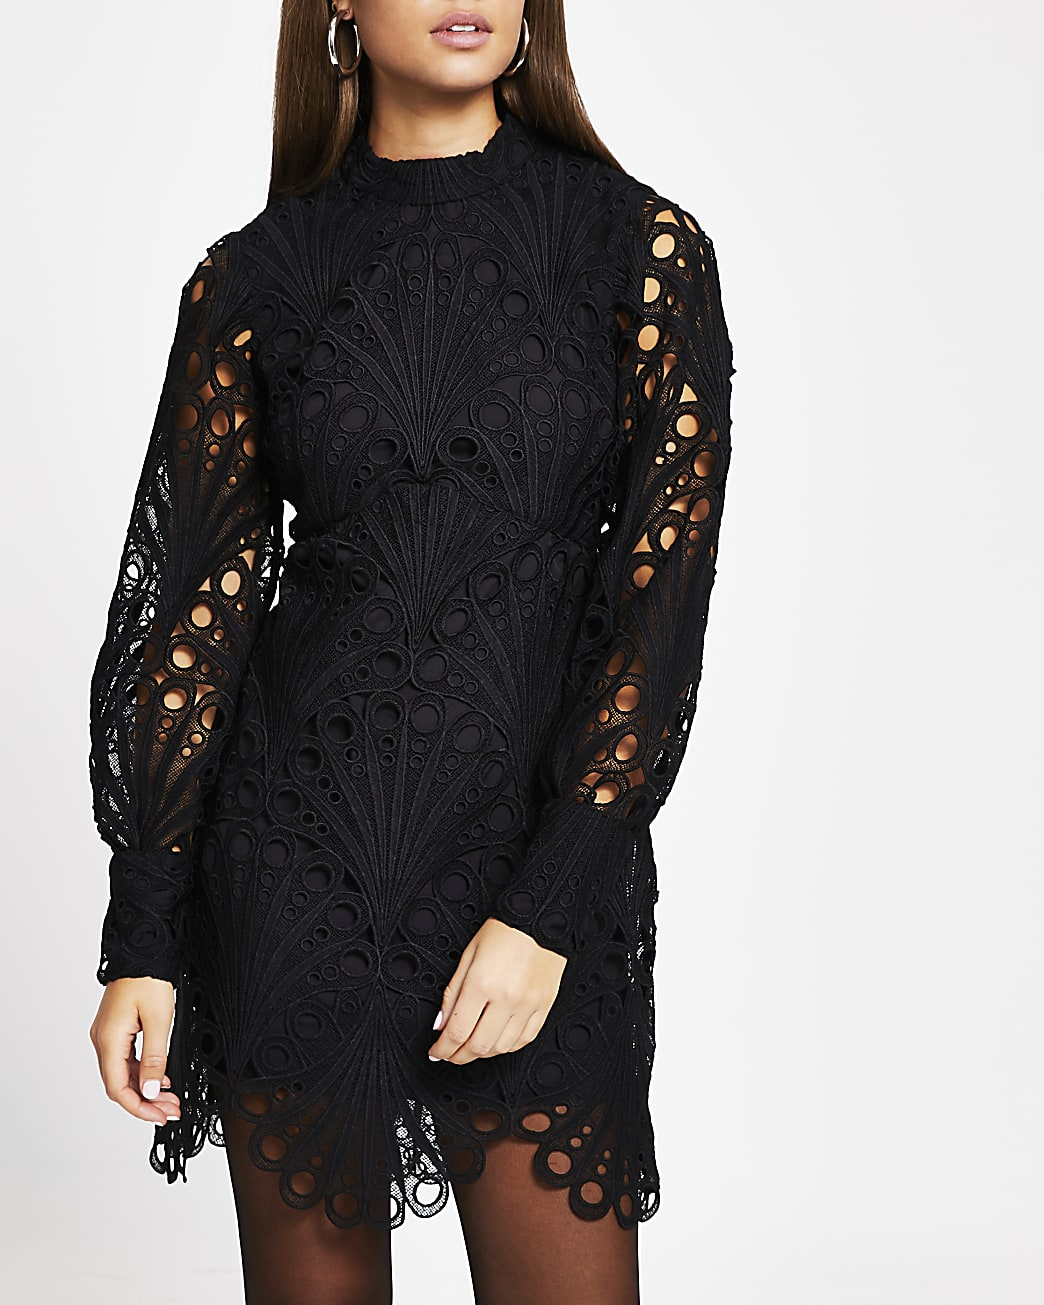 Black lace puff sleeve shift dress